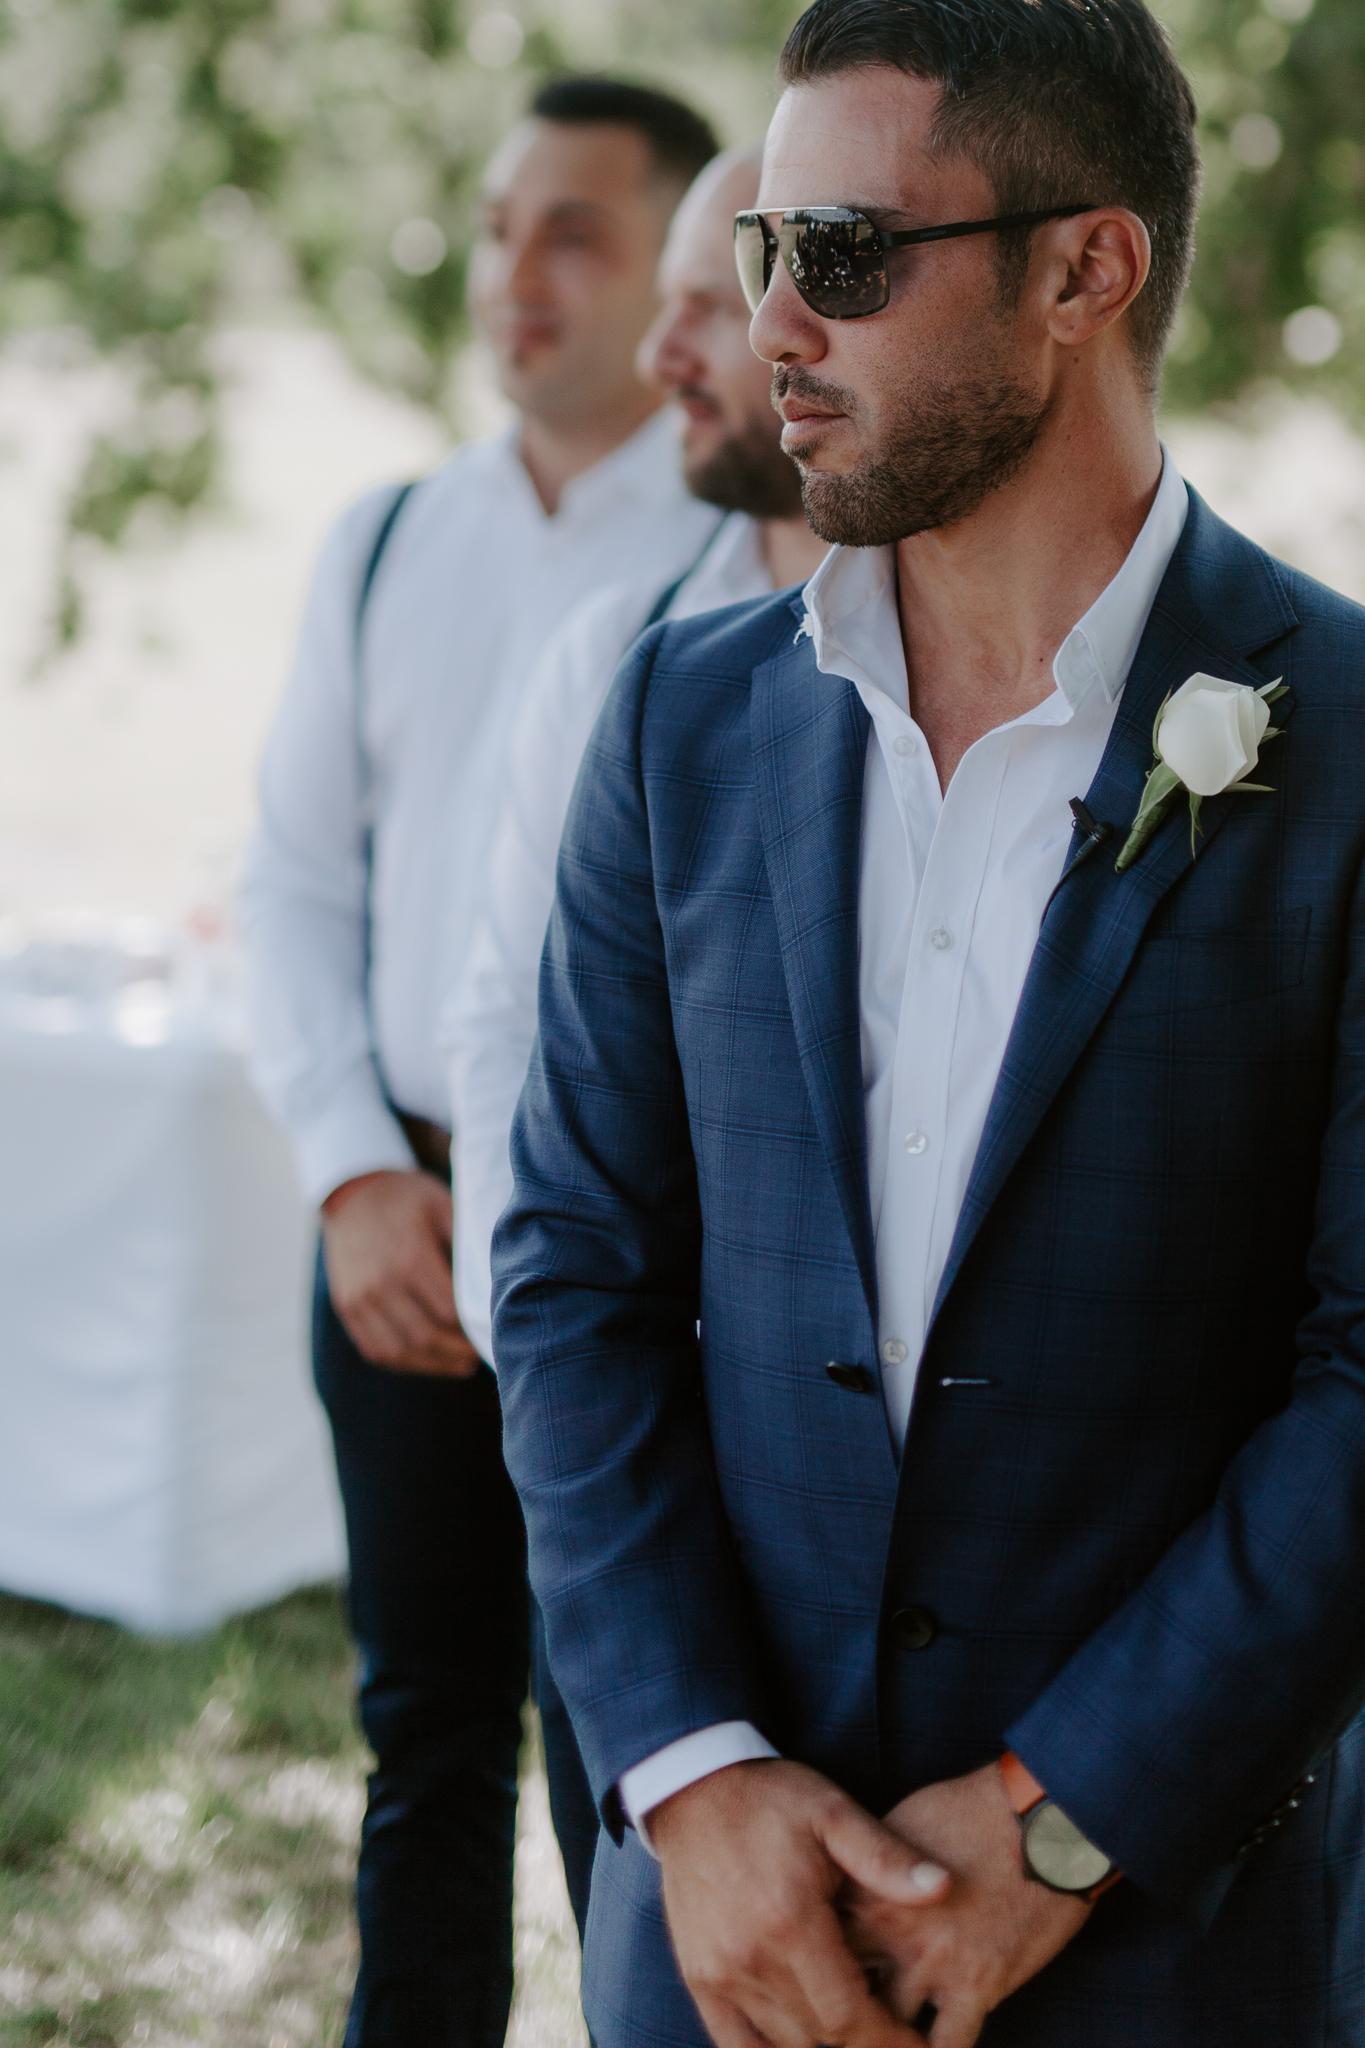 The-Stones-of-Yarra-Valley-Wedding-EmotionsandMathPhotography-107.jpg